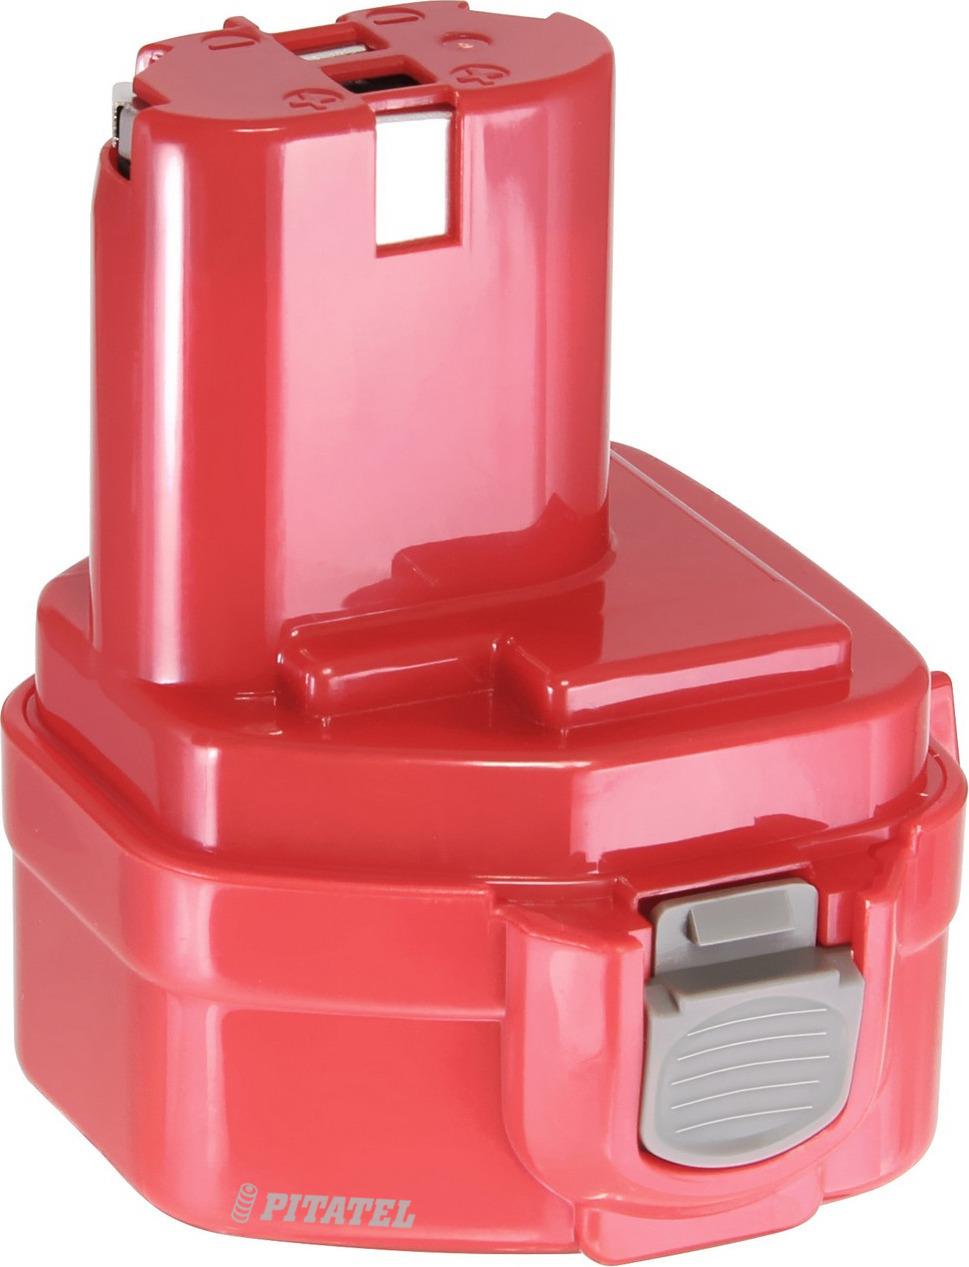 цена на Аккумулятор для инструмента MAKITA Pitatel TSB-039-MAK12-20C, вишневый-красный